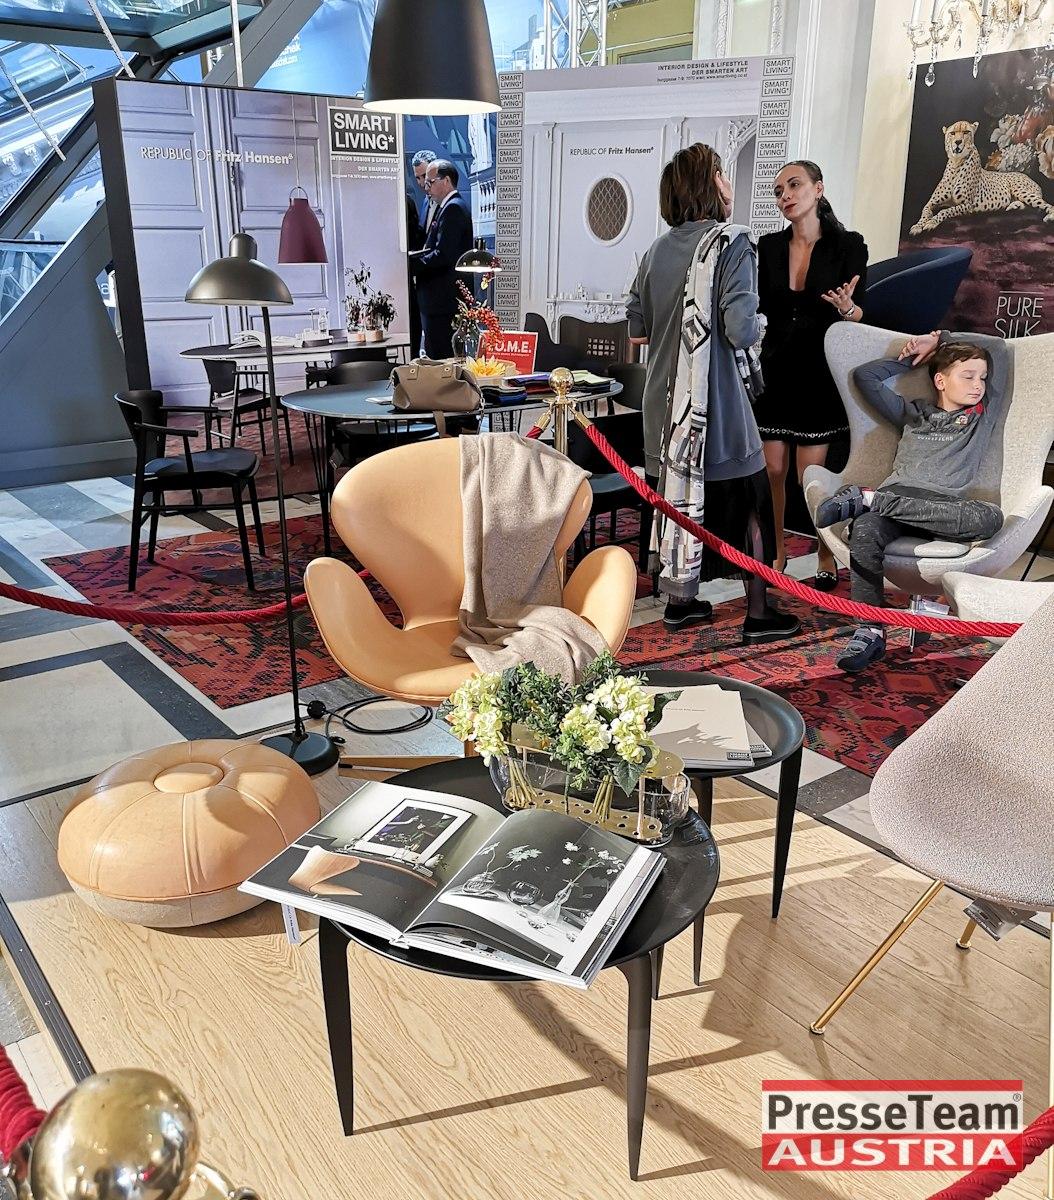 Messe Hofburg Wien 113 - Luxus Möbelmesse & Lifestyle in der Hofburg Wien